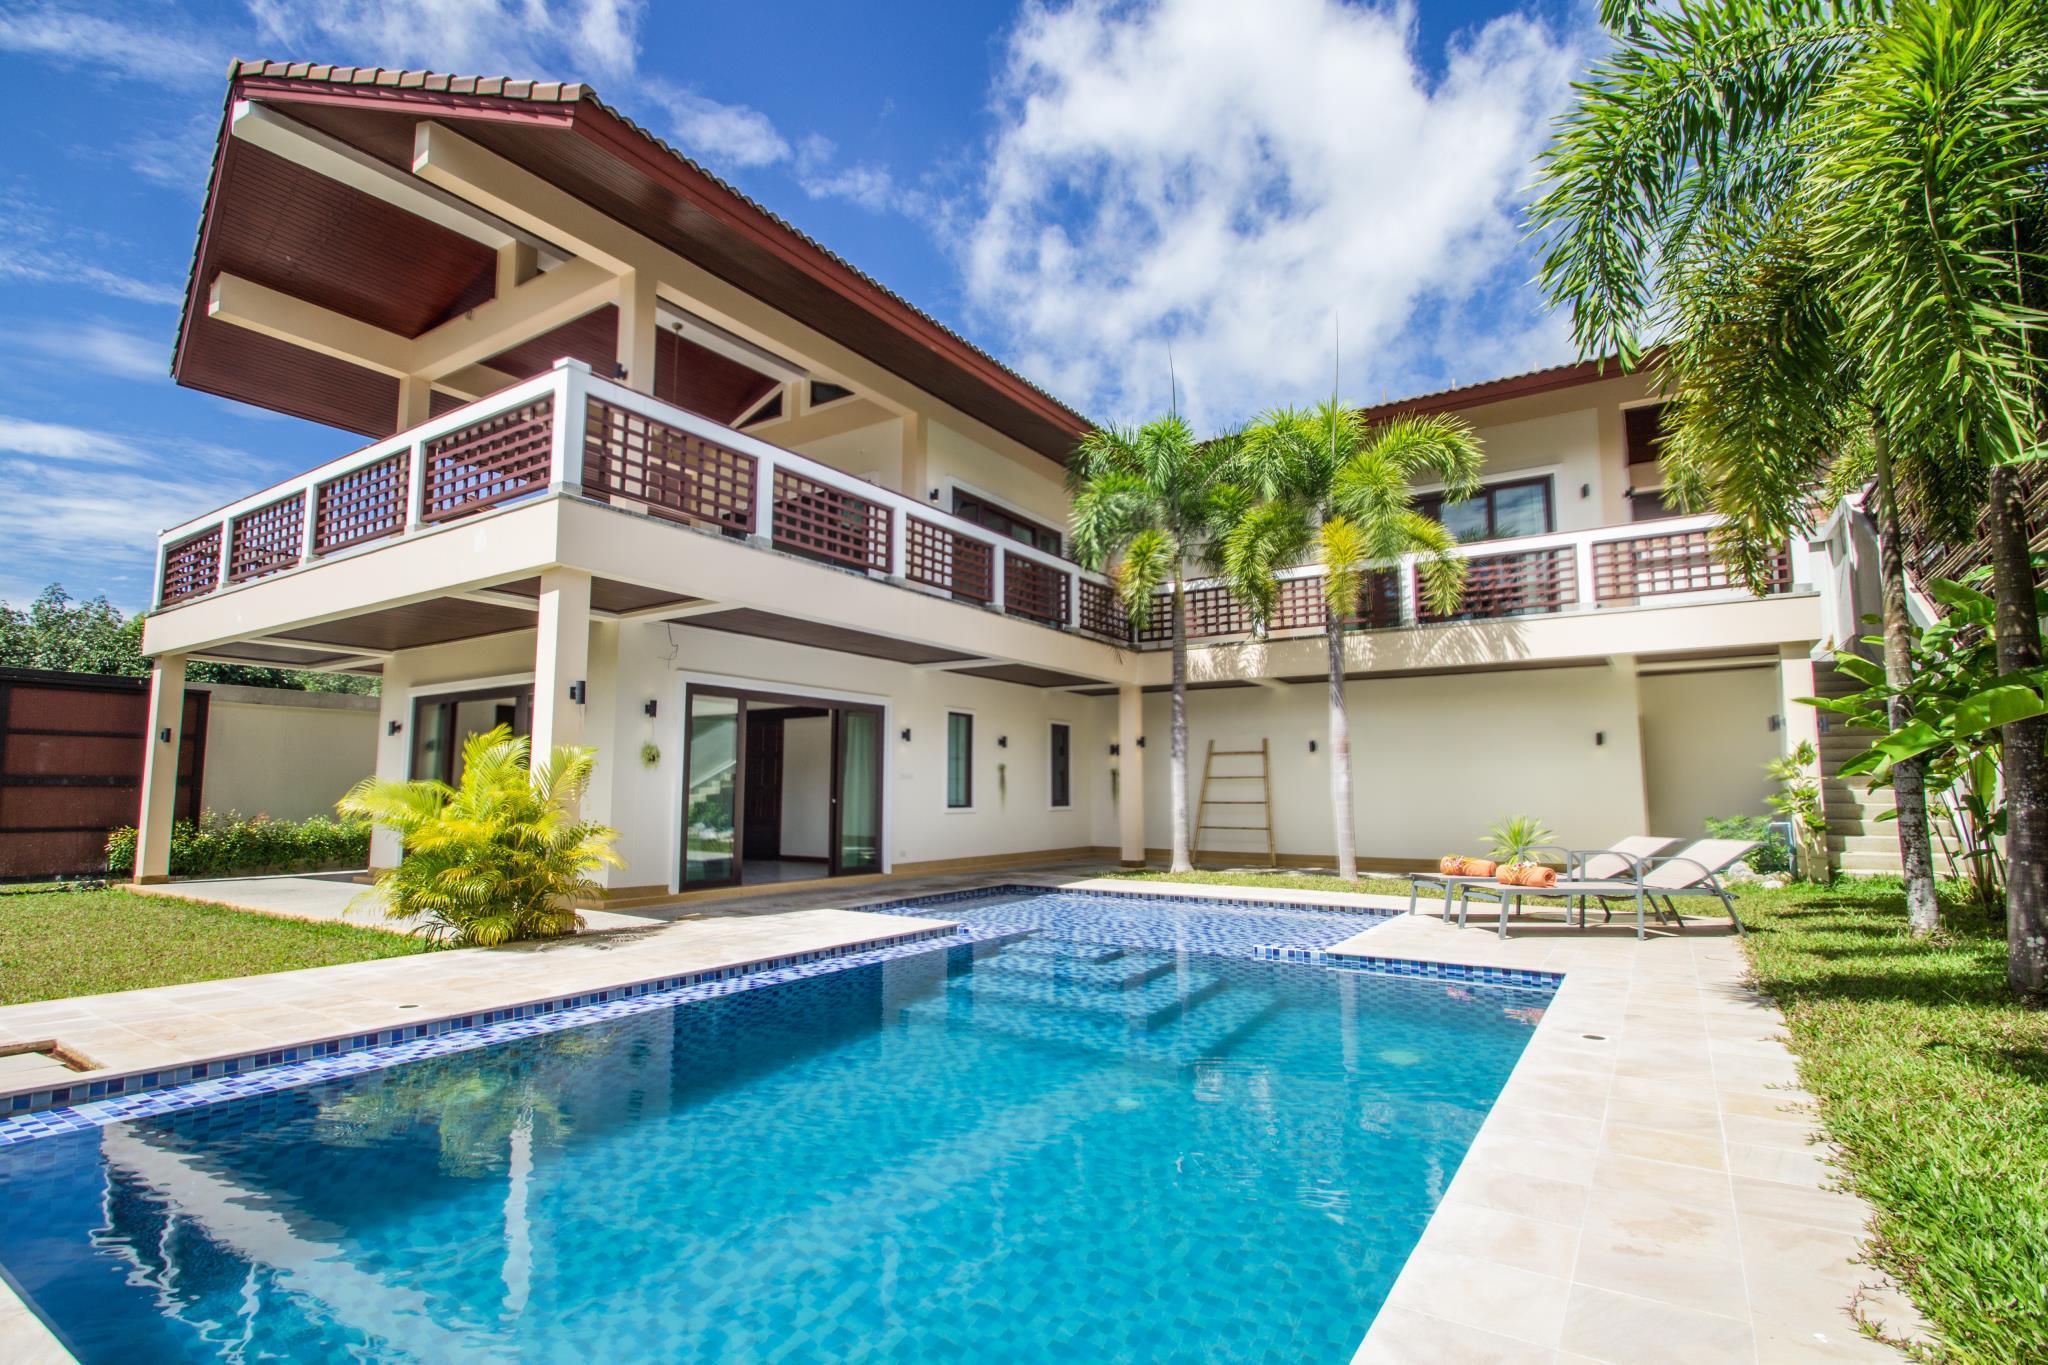 Infinity Pool Villa Infinity Pool Villa